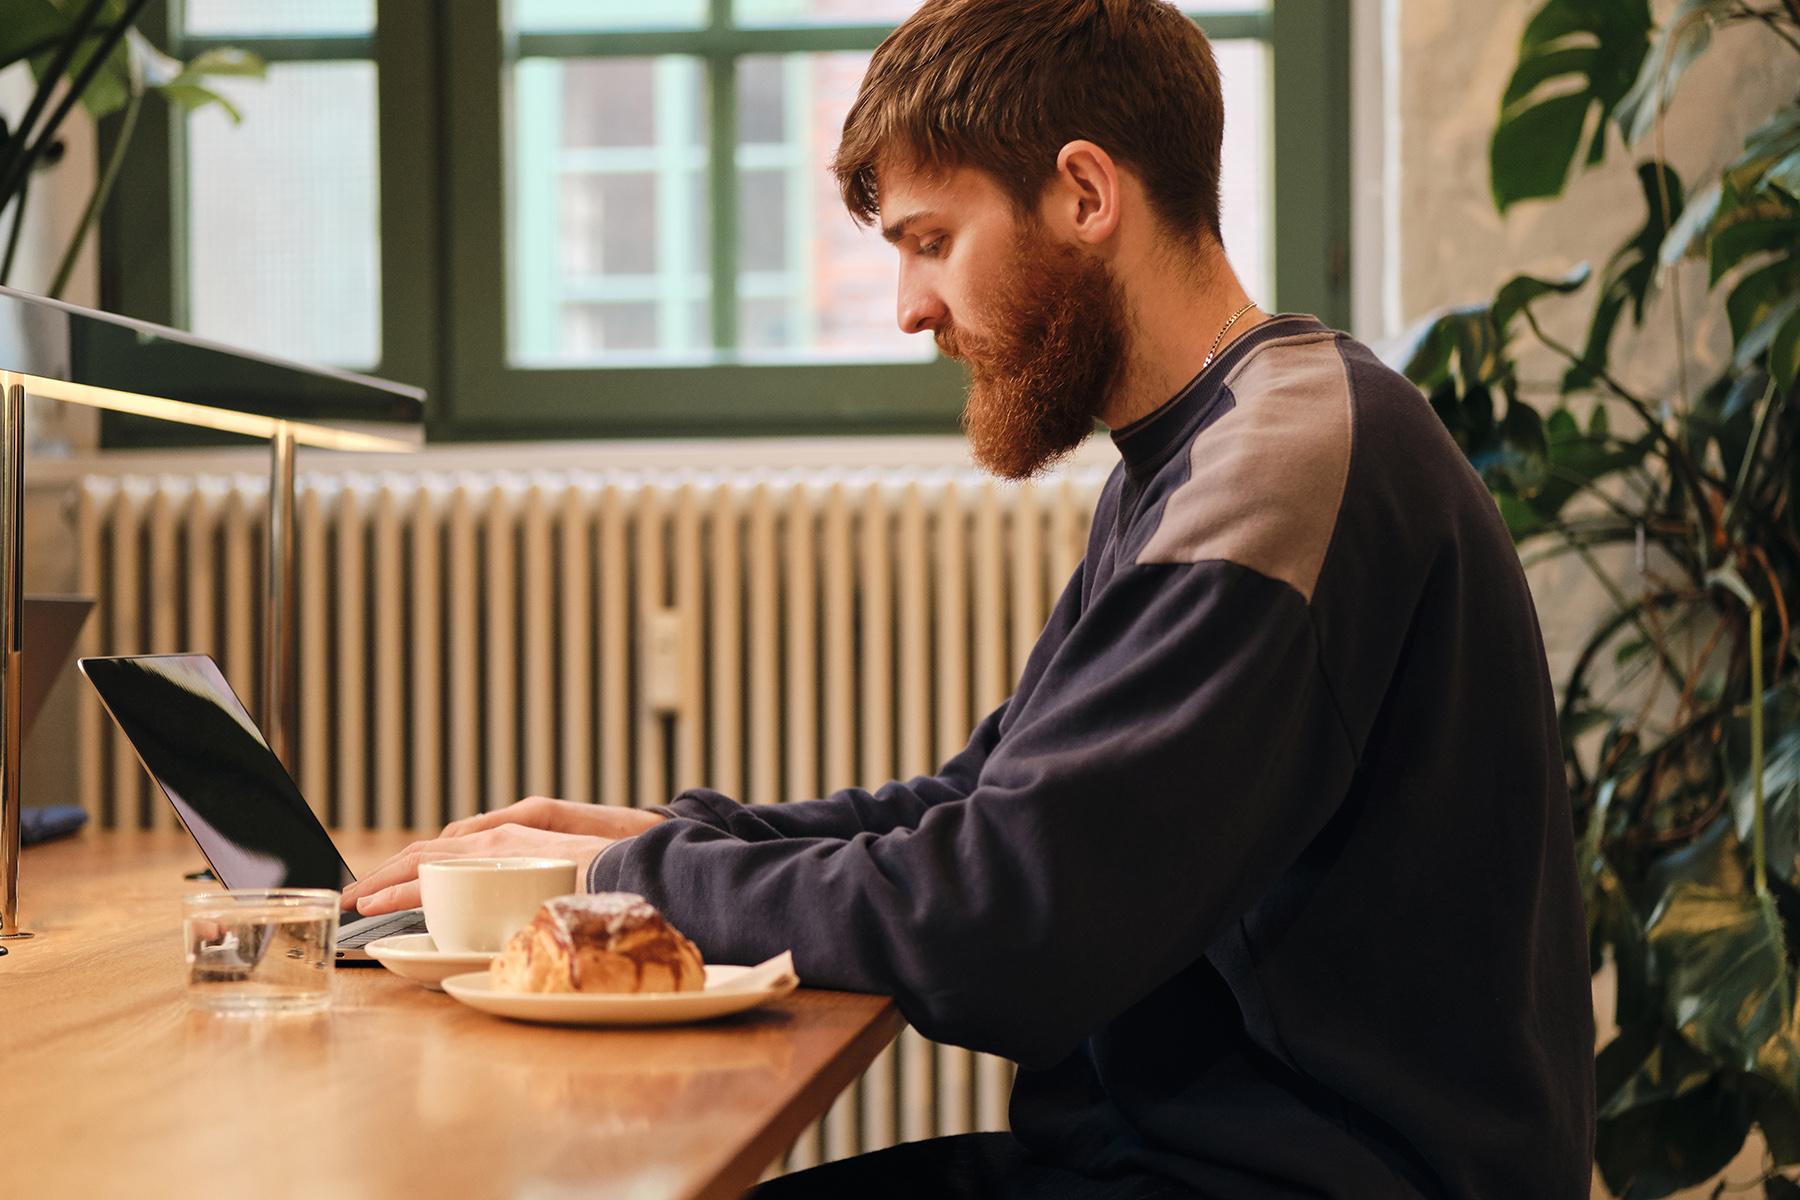 Man working in a café